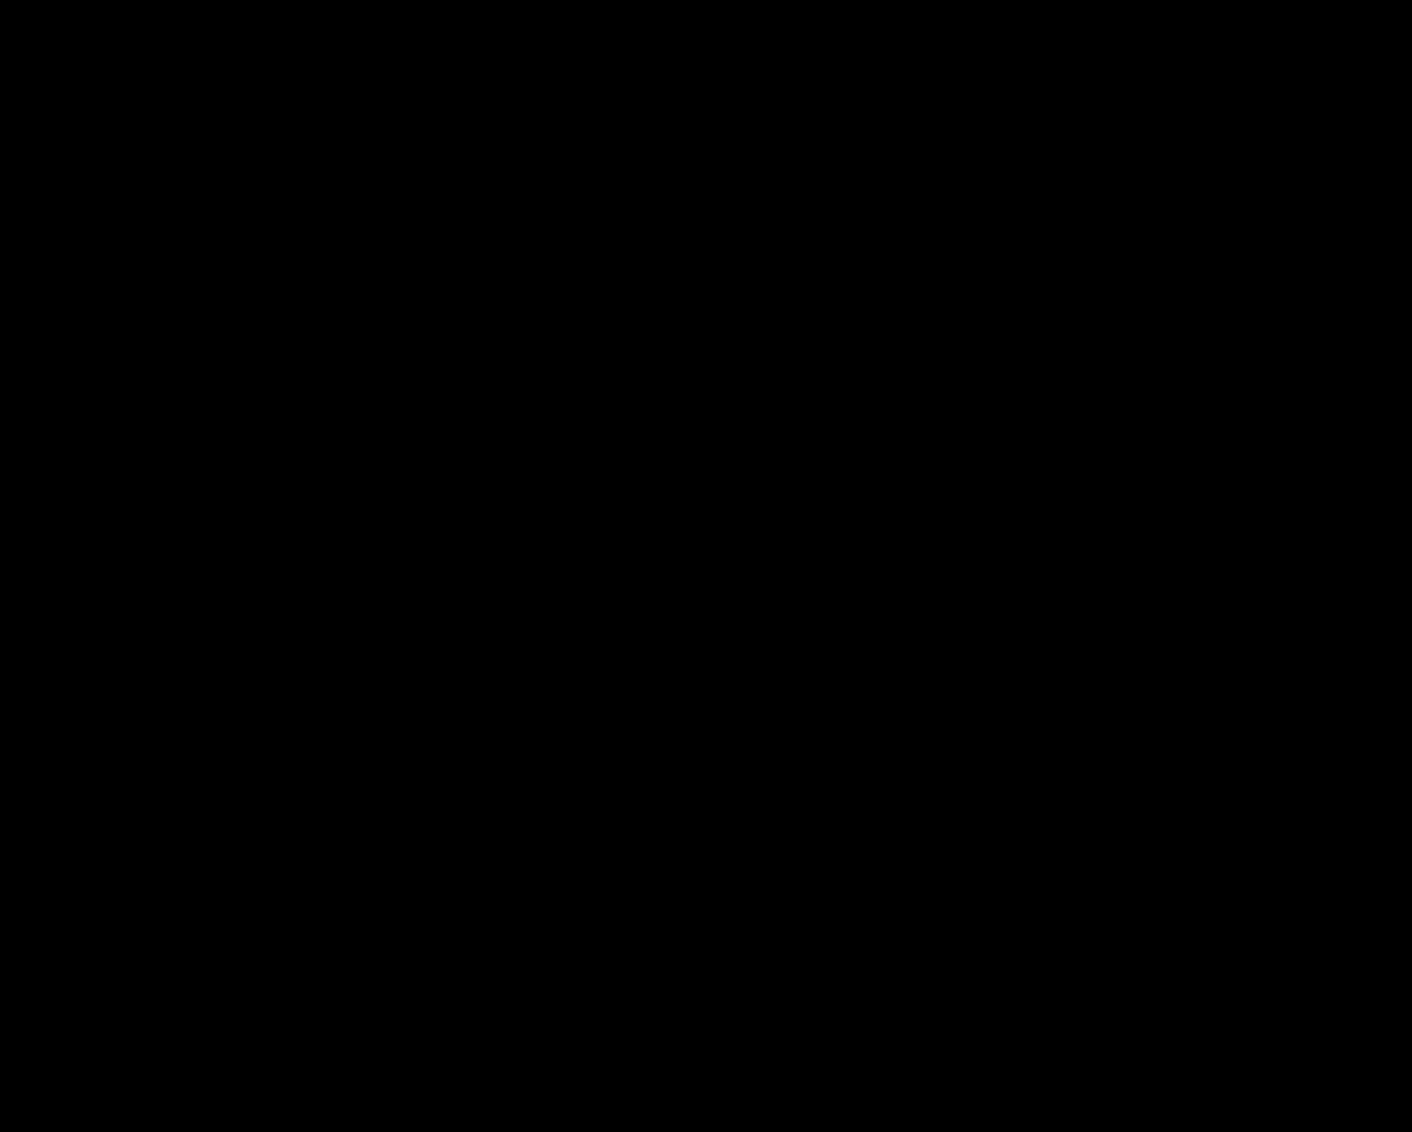 IOX2-d<sub>5</sub>